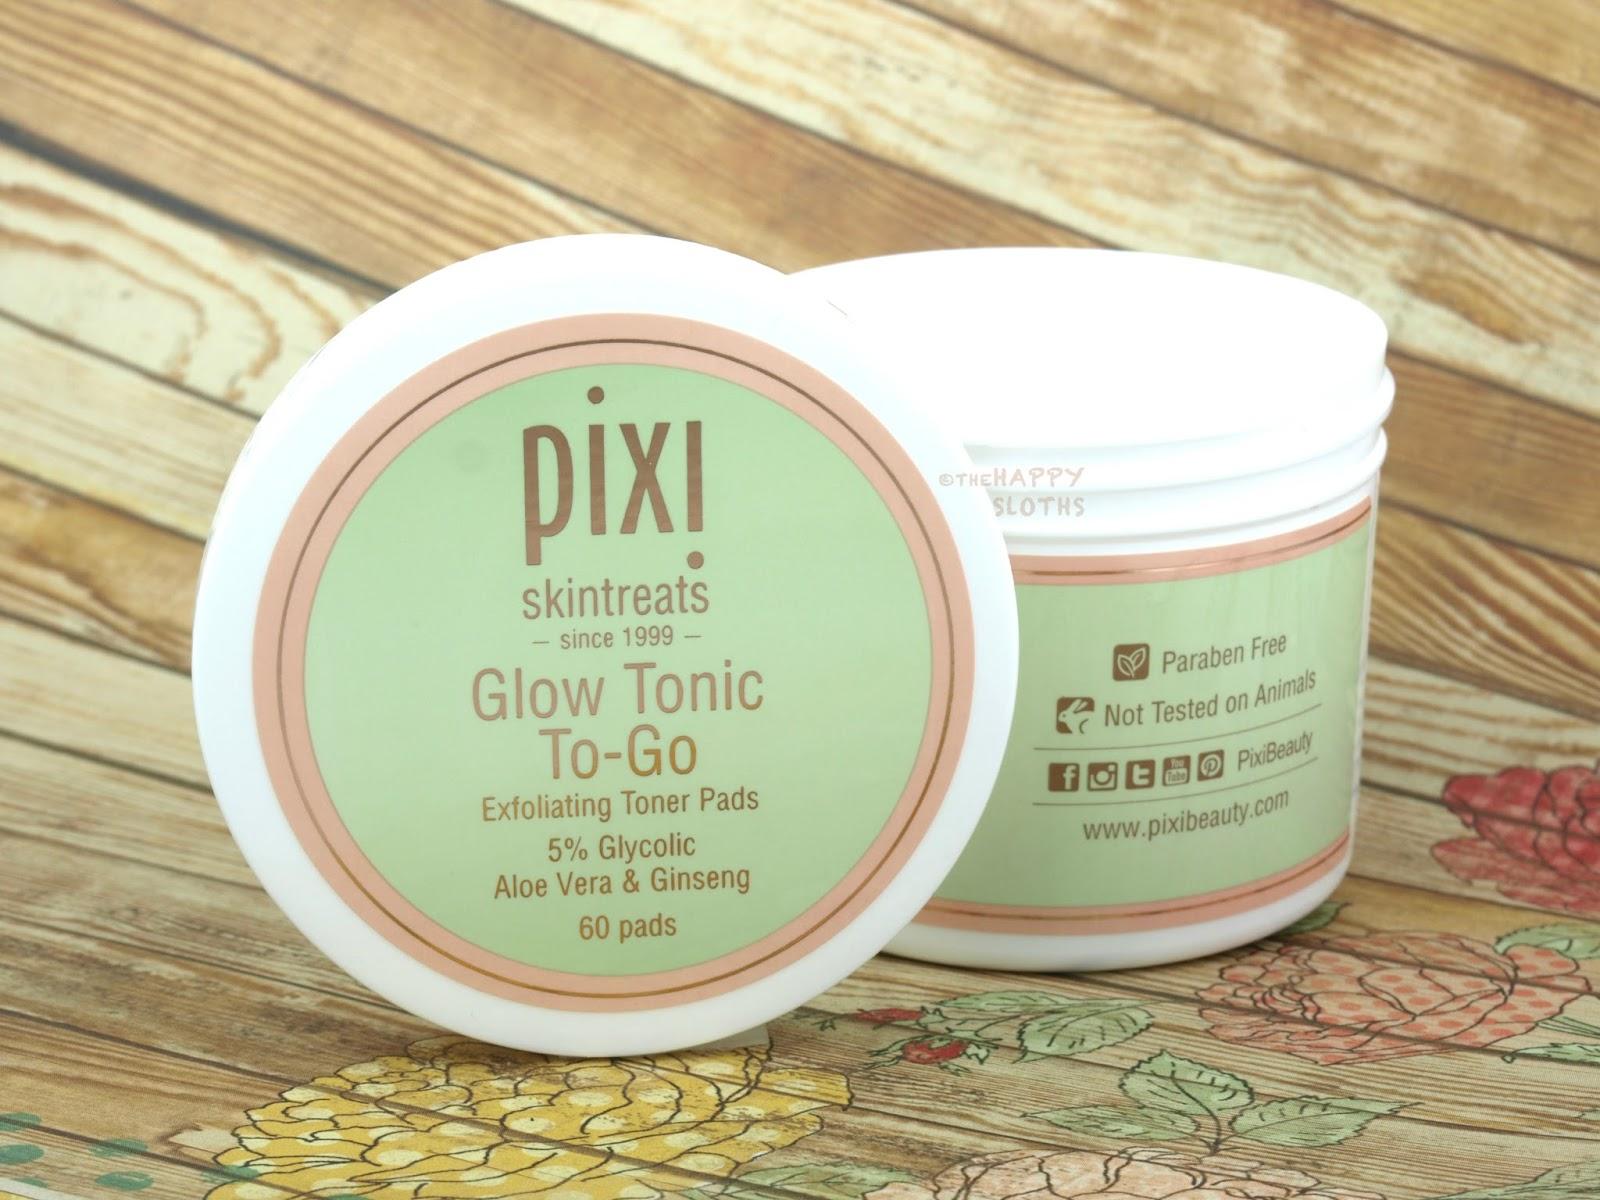 Pixi Glow Tonic To-Go Exfoliating Toner Pads: Review | The